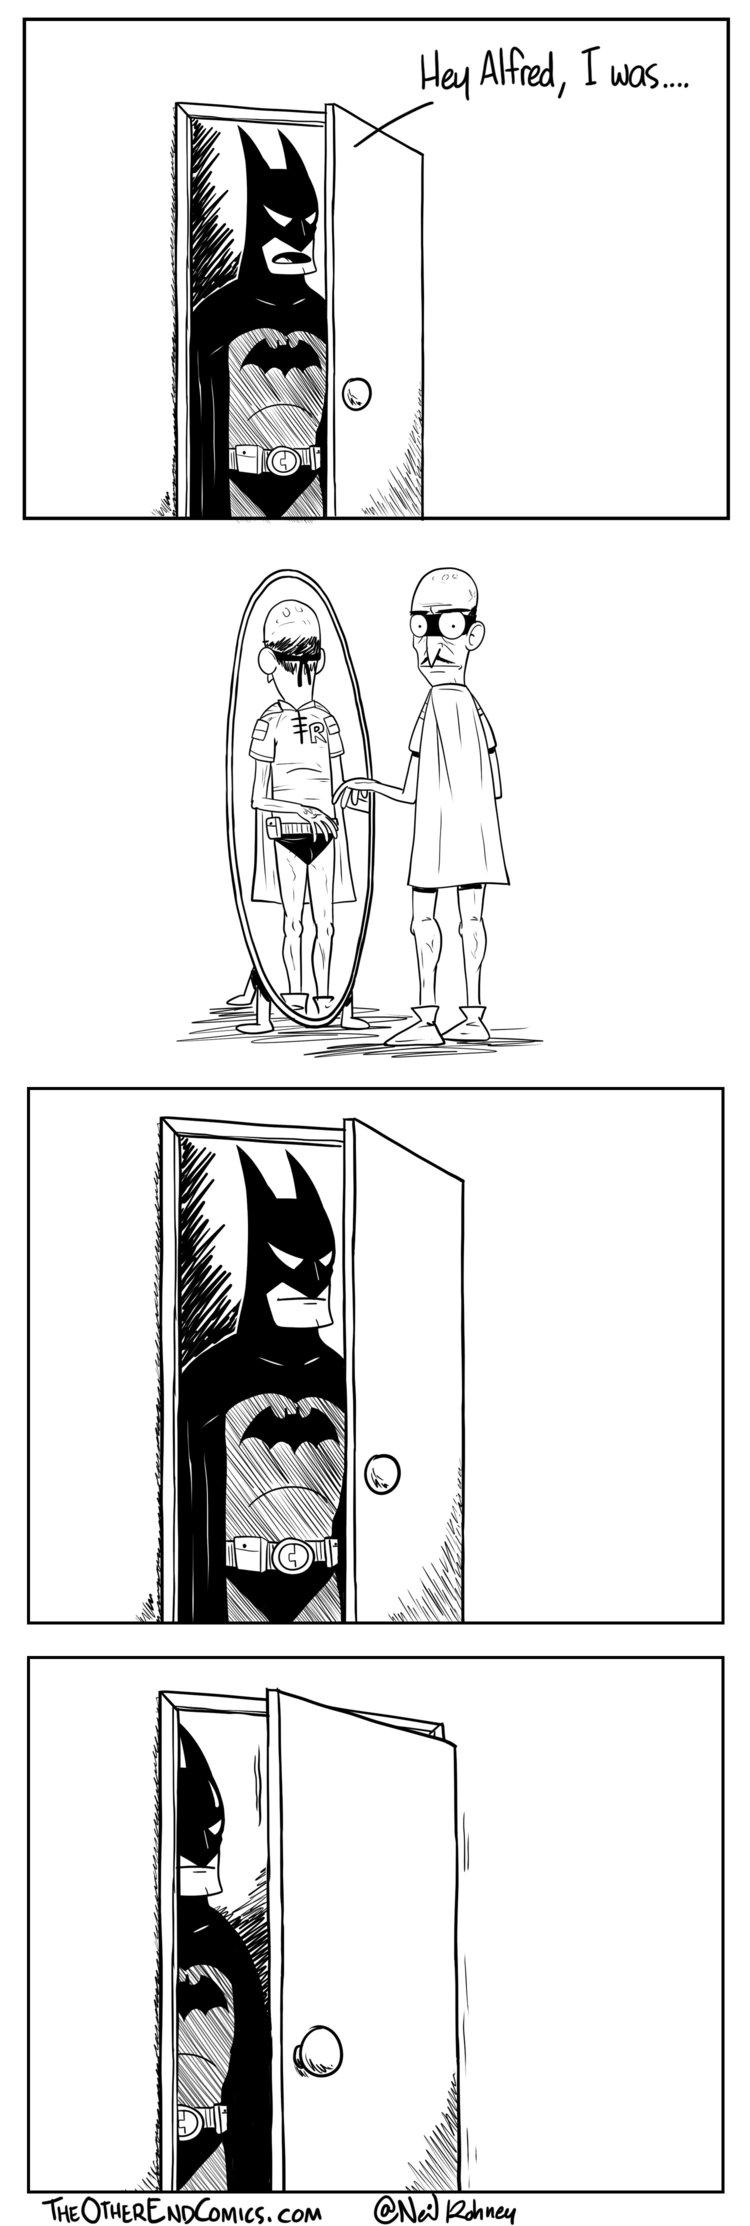 batman-comic-strip-alfreds-secret-shame